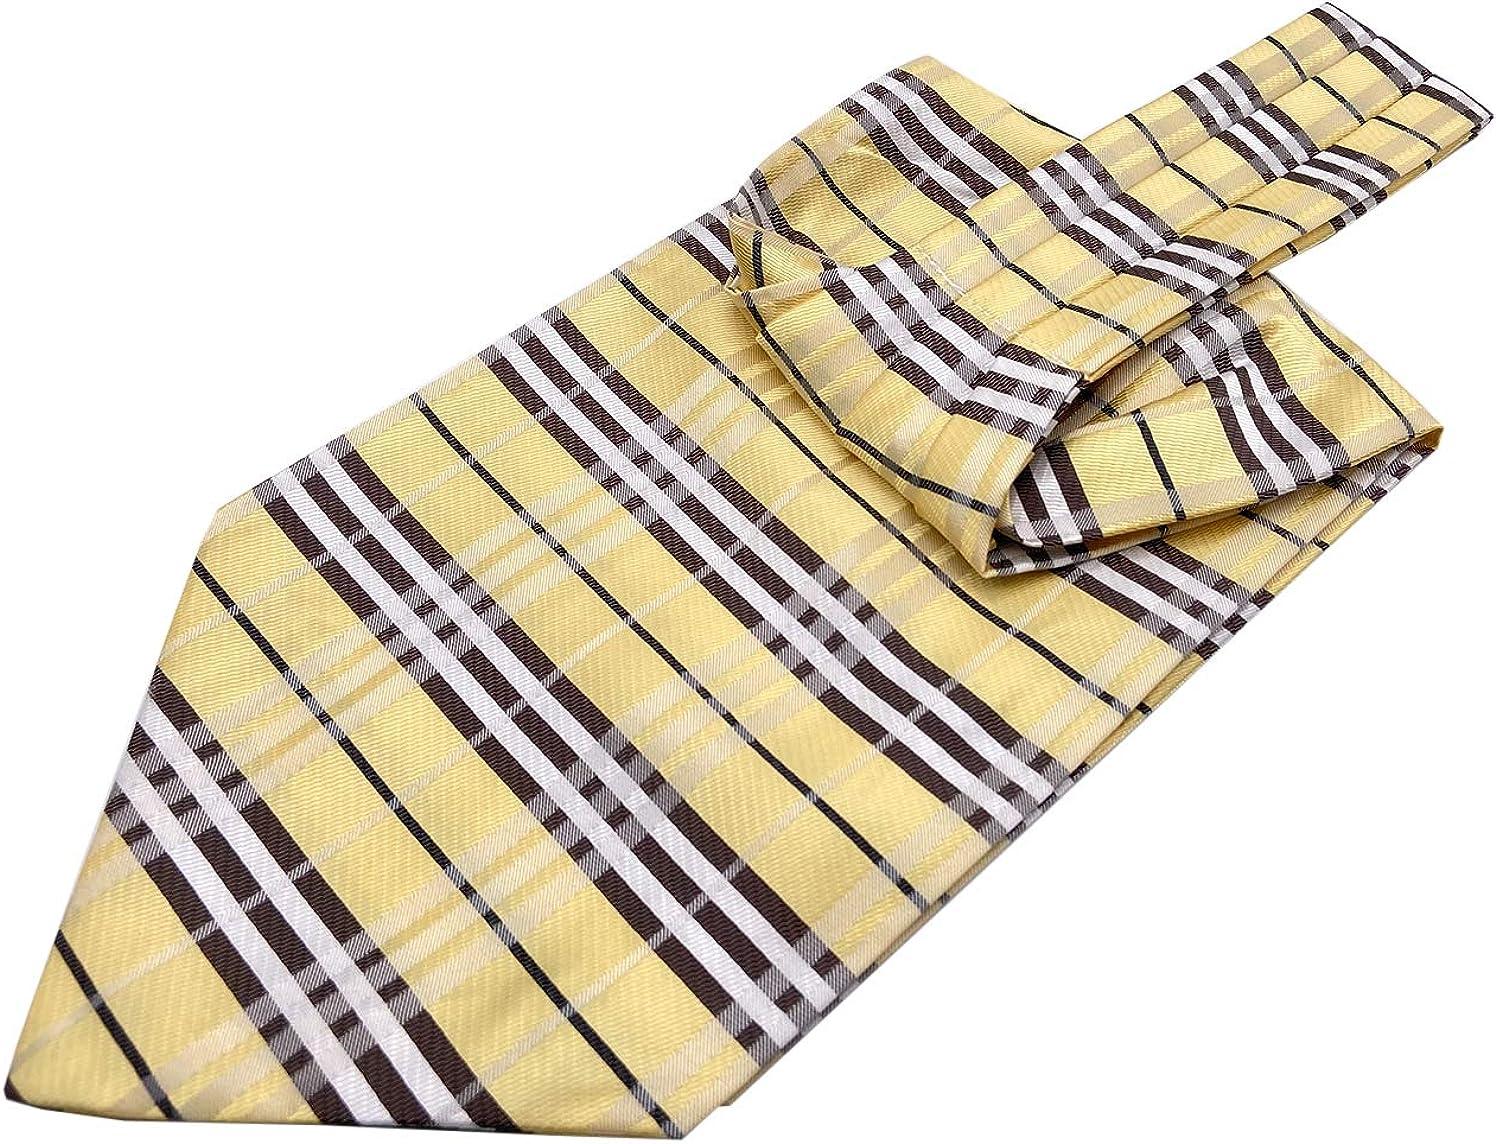 AYOSUSH Mens Ascots Cravat Tie Silk Jacquard Woven Luxury Ascot Wedding Business